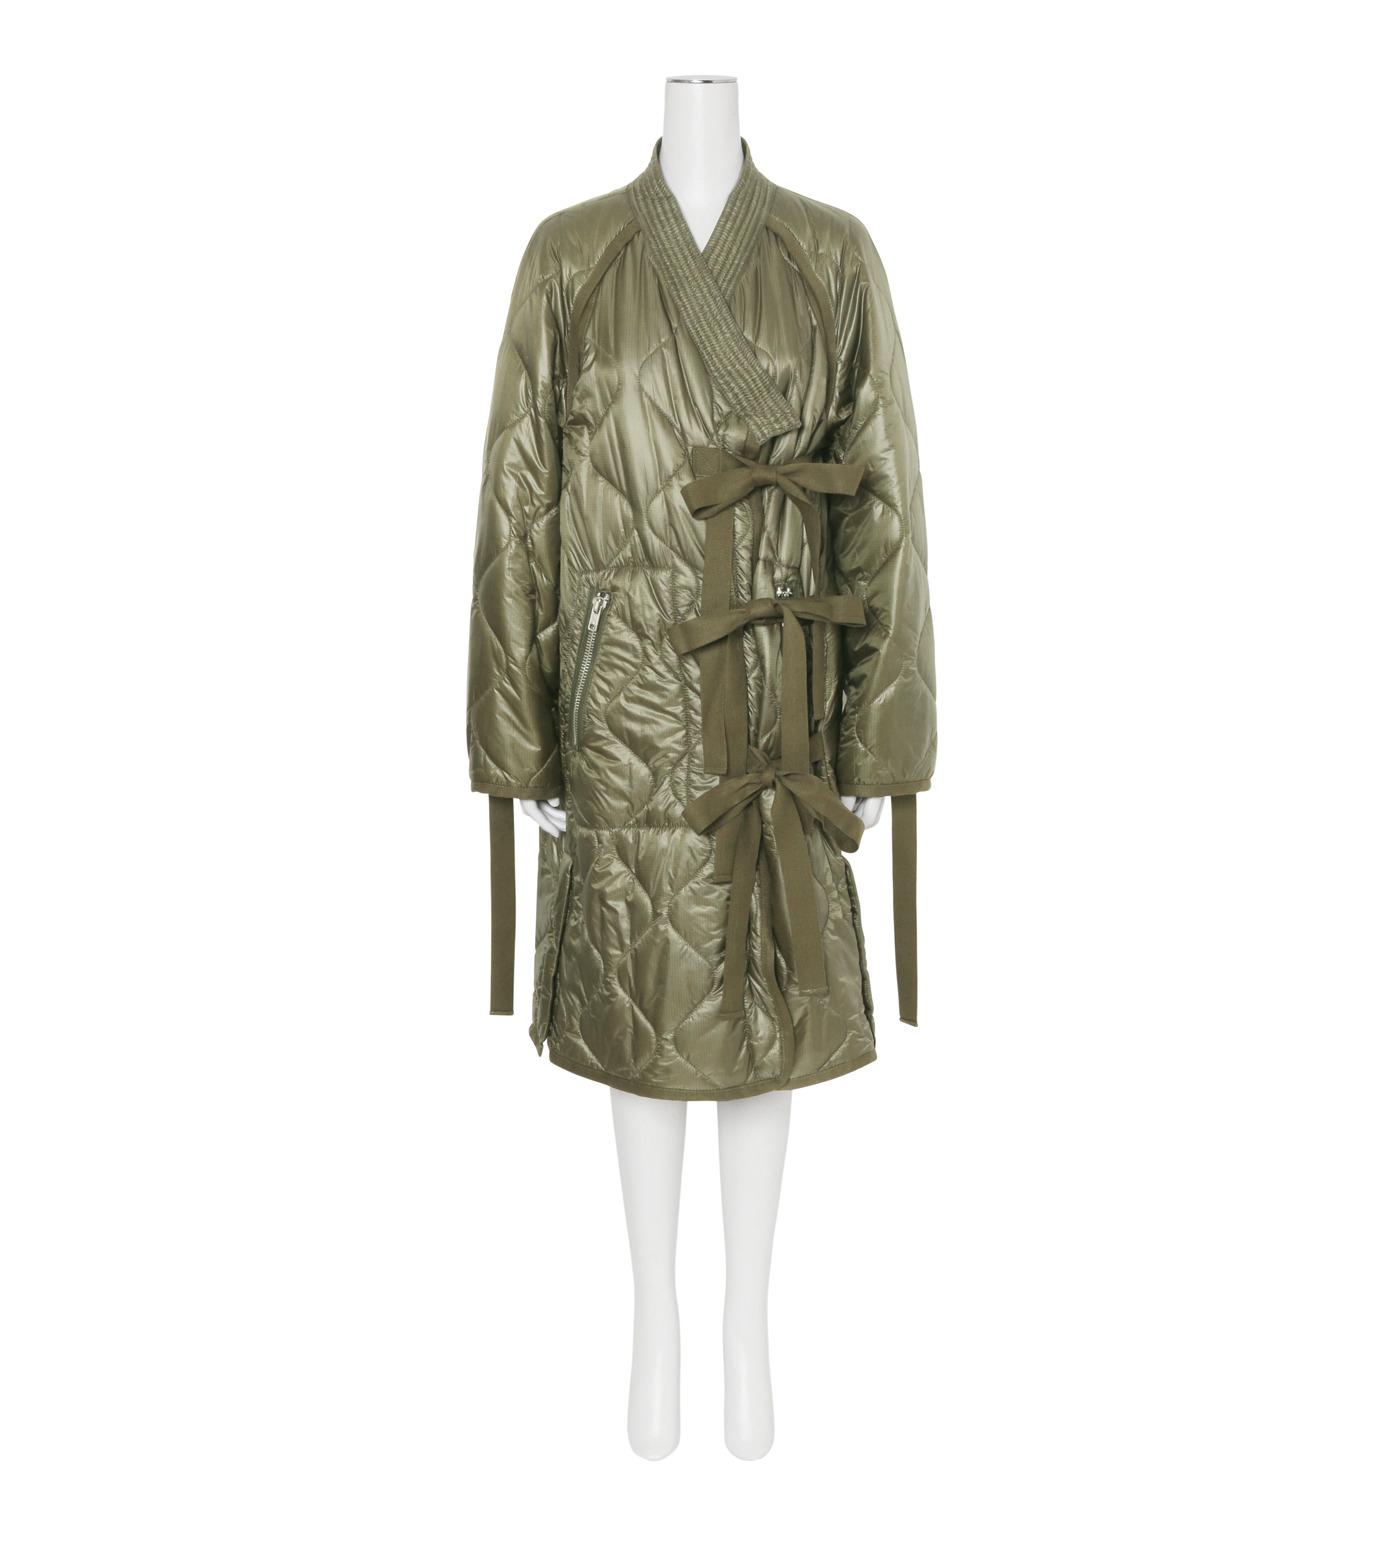 3.1 Phillip Lim(スリーワン フィリップリム)のLong Utility Kimono Jacket-KHAKI(コート/coat)-F161-8326RSN-24 拡大詳細画像3